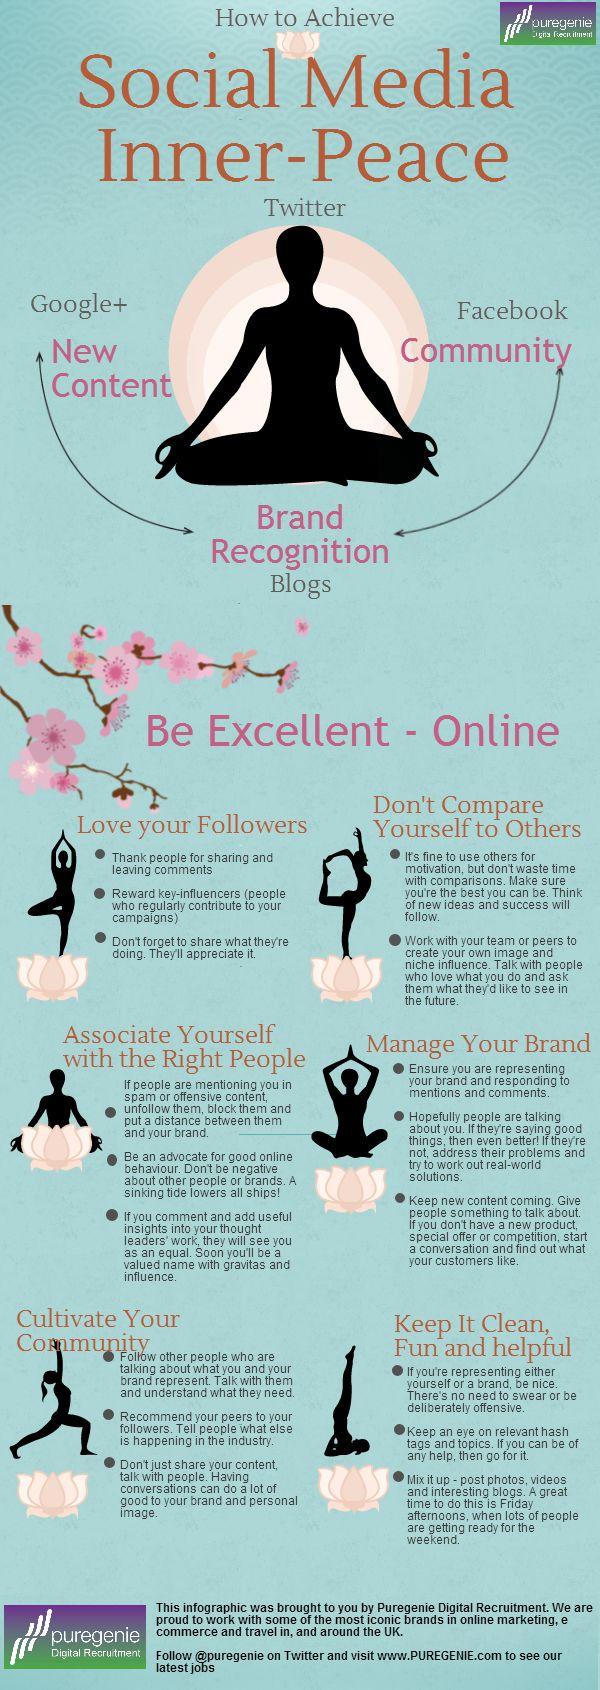 Social Media Inner Peace #infografia #infographic #socialmedia